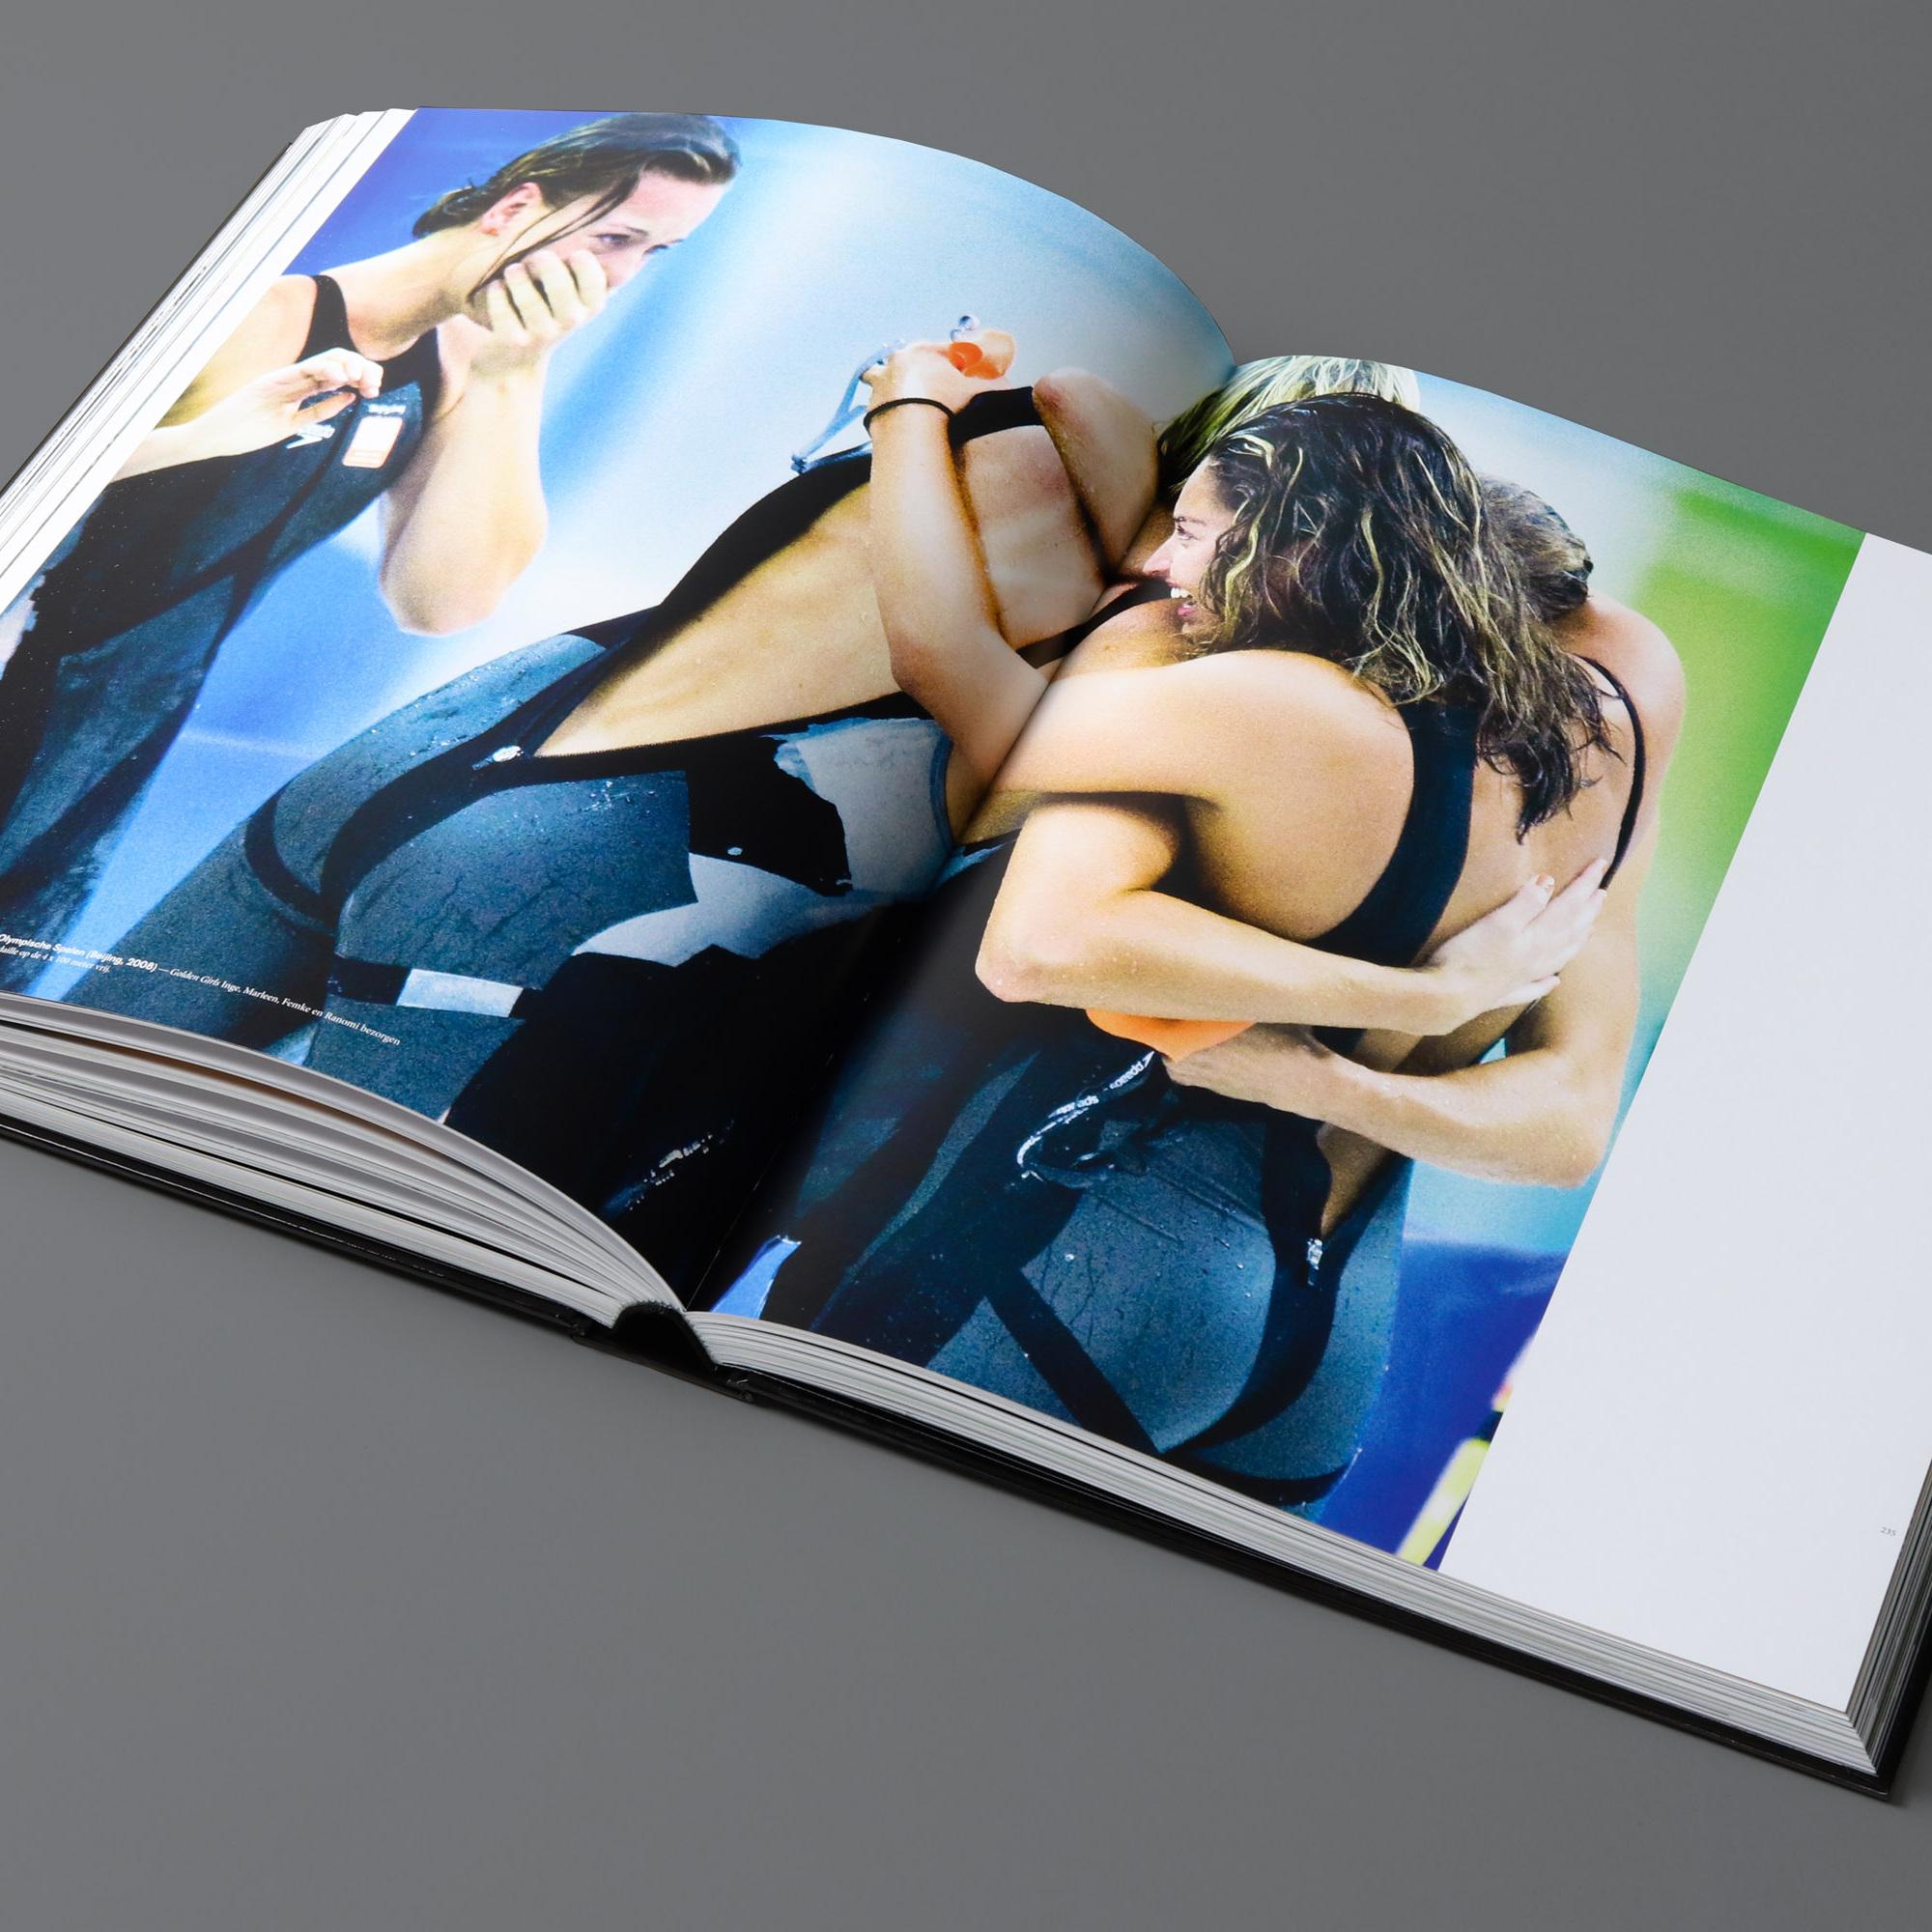 mendo-books-Sportret-studio-01-11-van-18-2000x2000-c-default.jpg